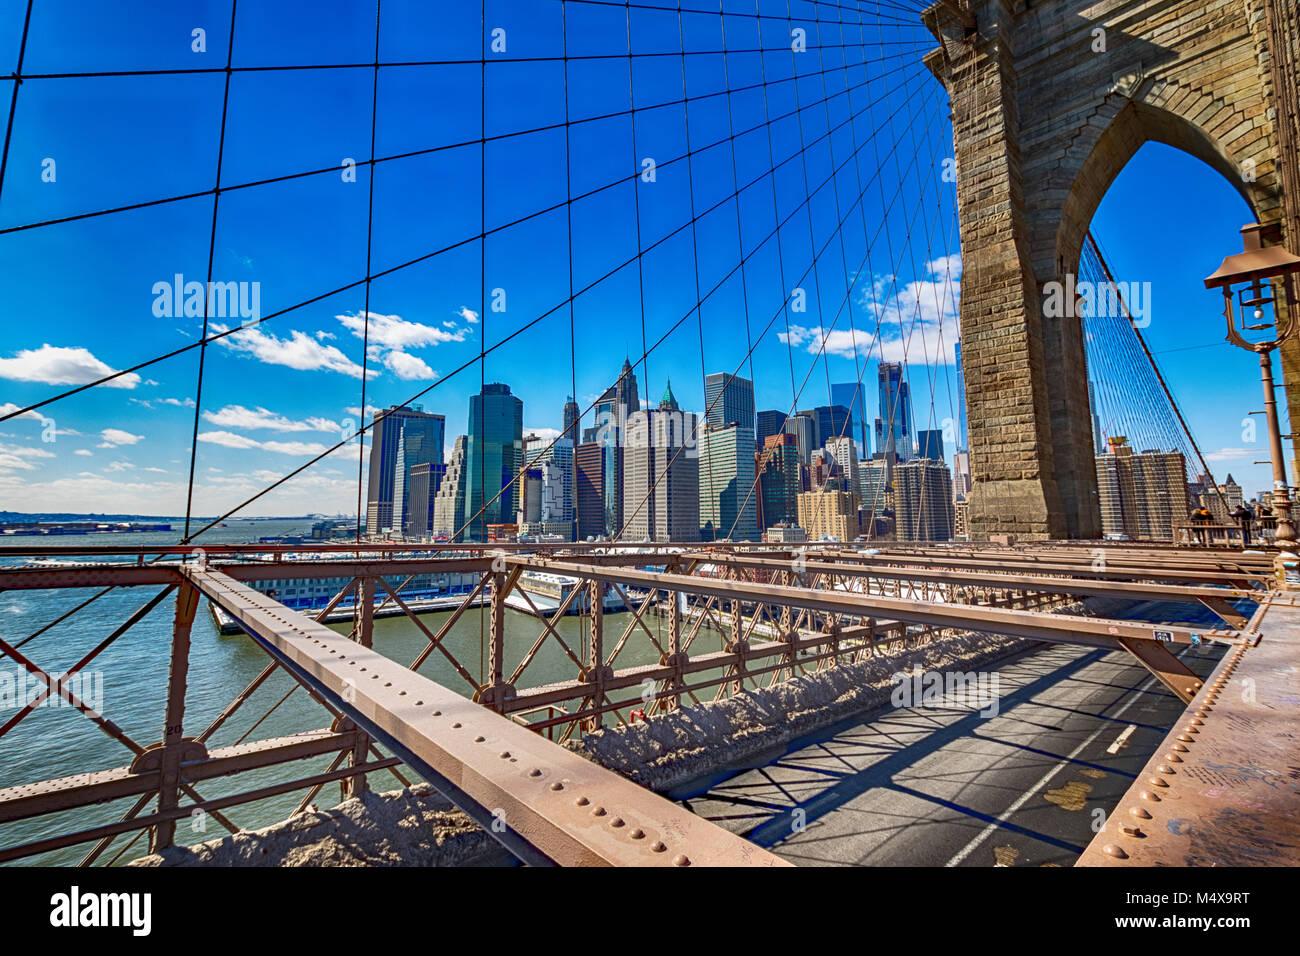 The Brooklyn Bridge and the skyline of Manhattan. - Stock Image